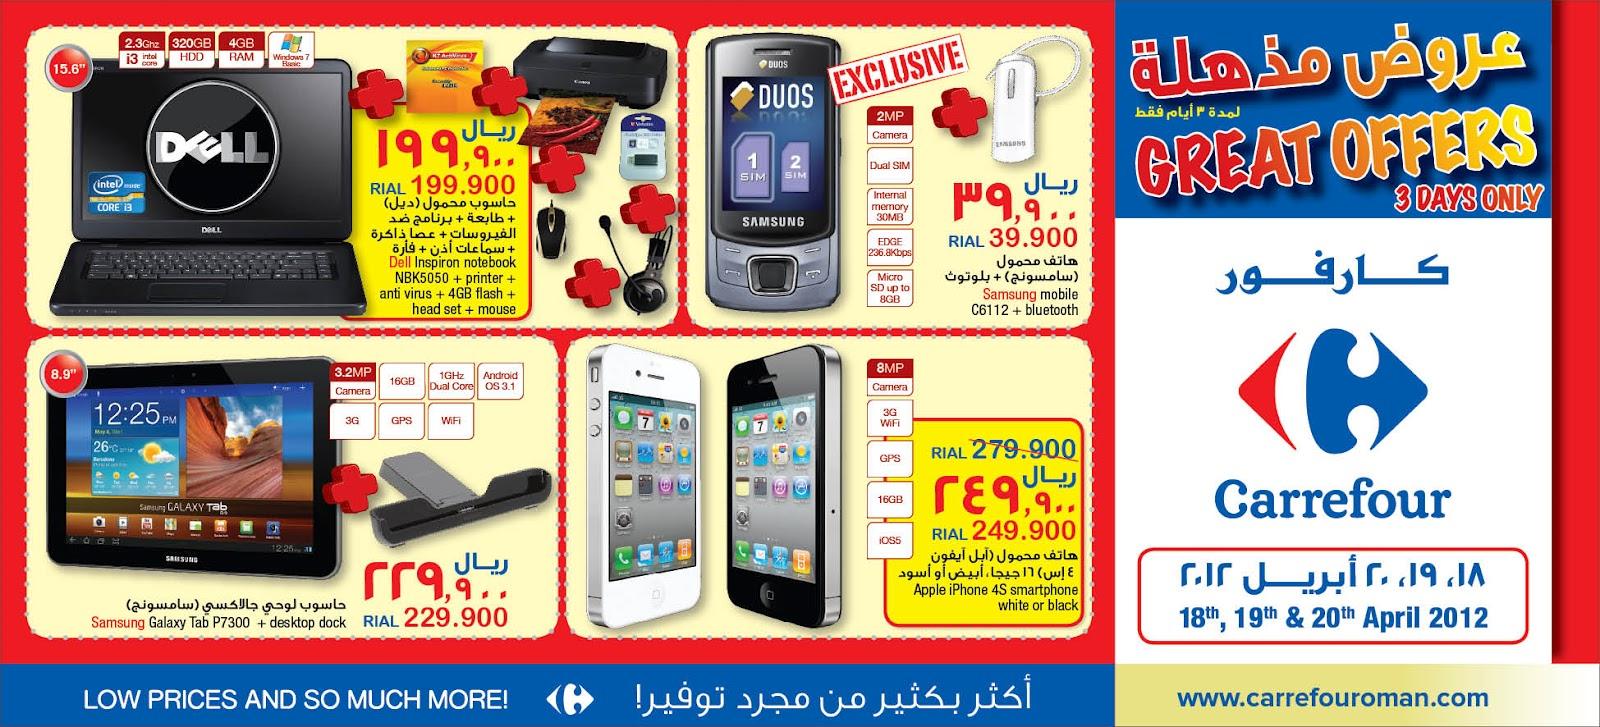 Oman Deals Carrefour 3 Days Offer Ends 20th April 2012